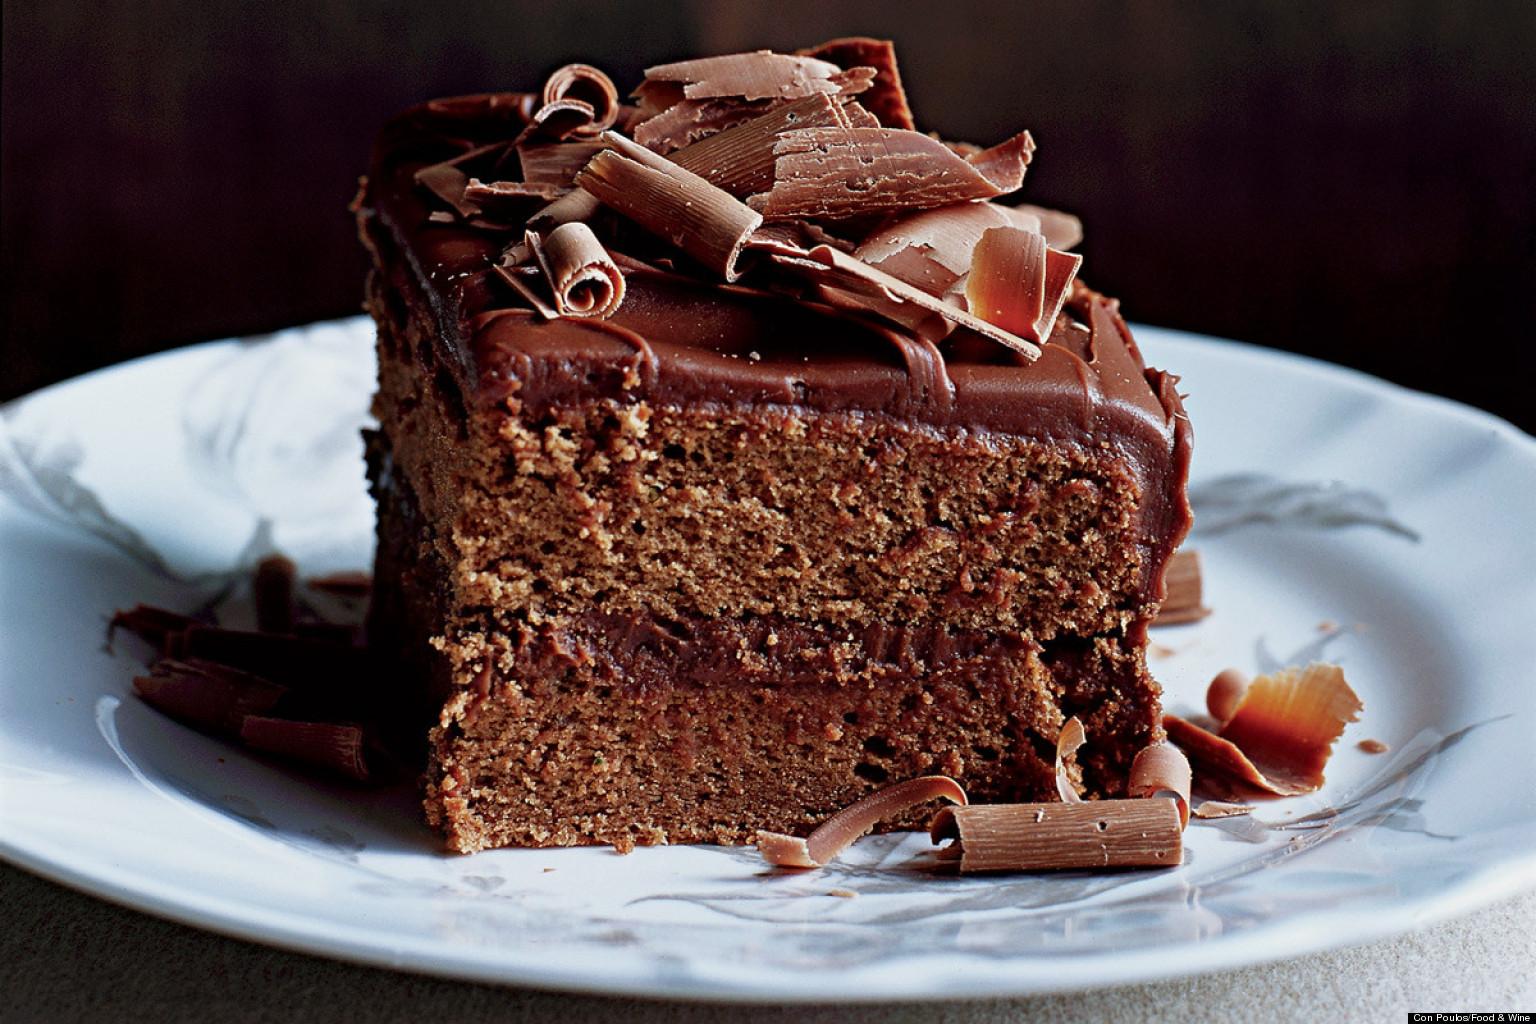 The Best Chocolate Cake Recipes You Ll Ever Make Photos